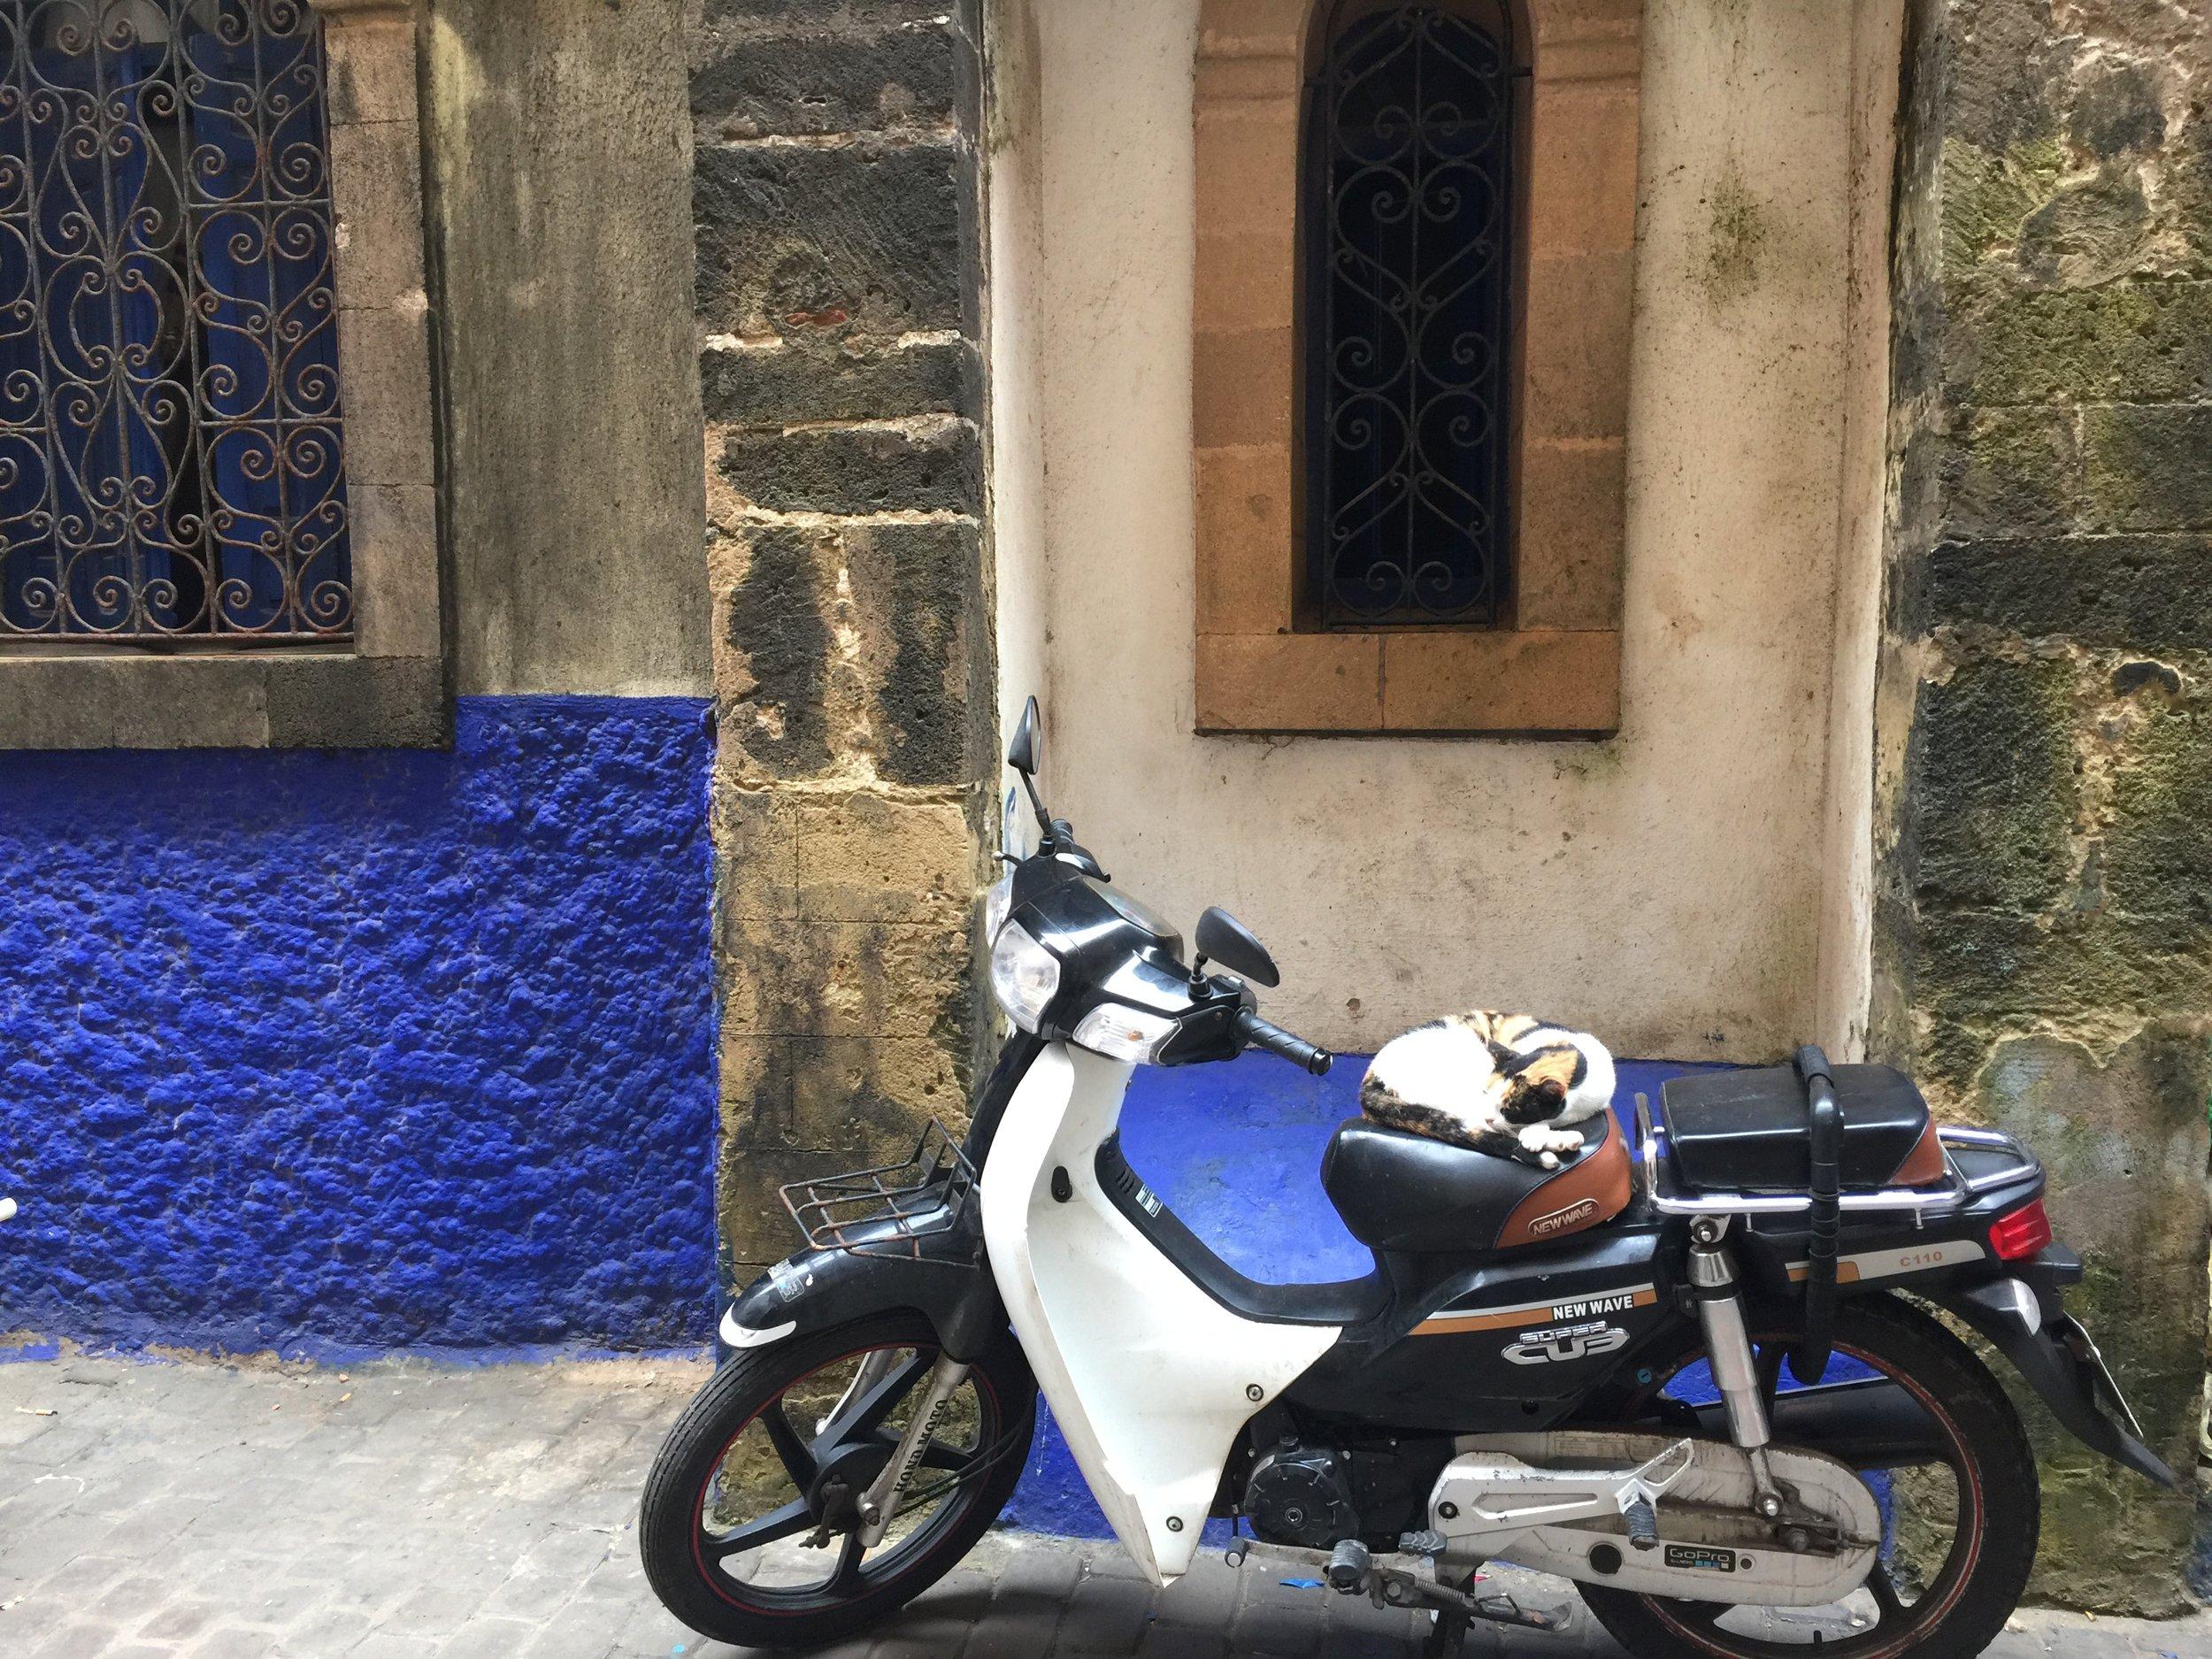 Cat nap on a moto. Streets of Essaouira, Morocco